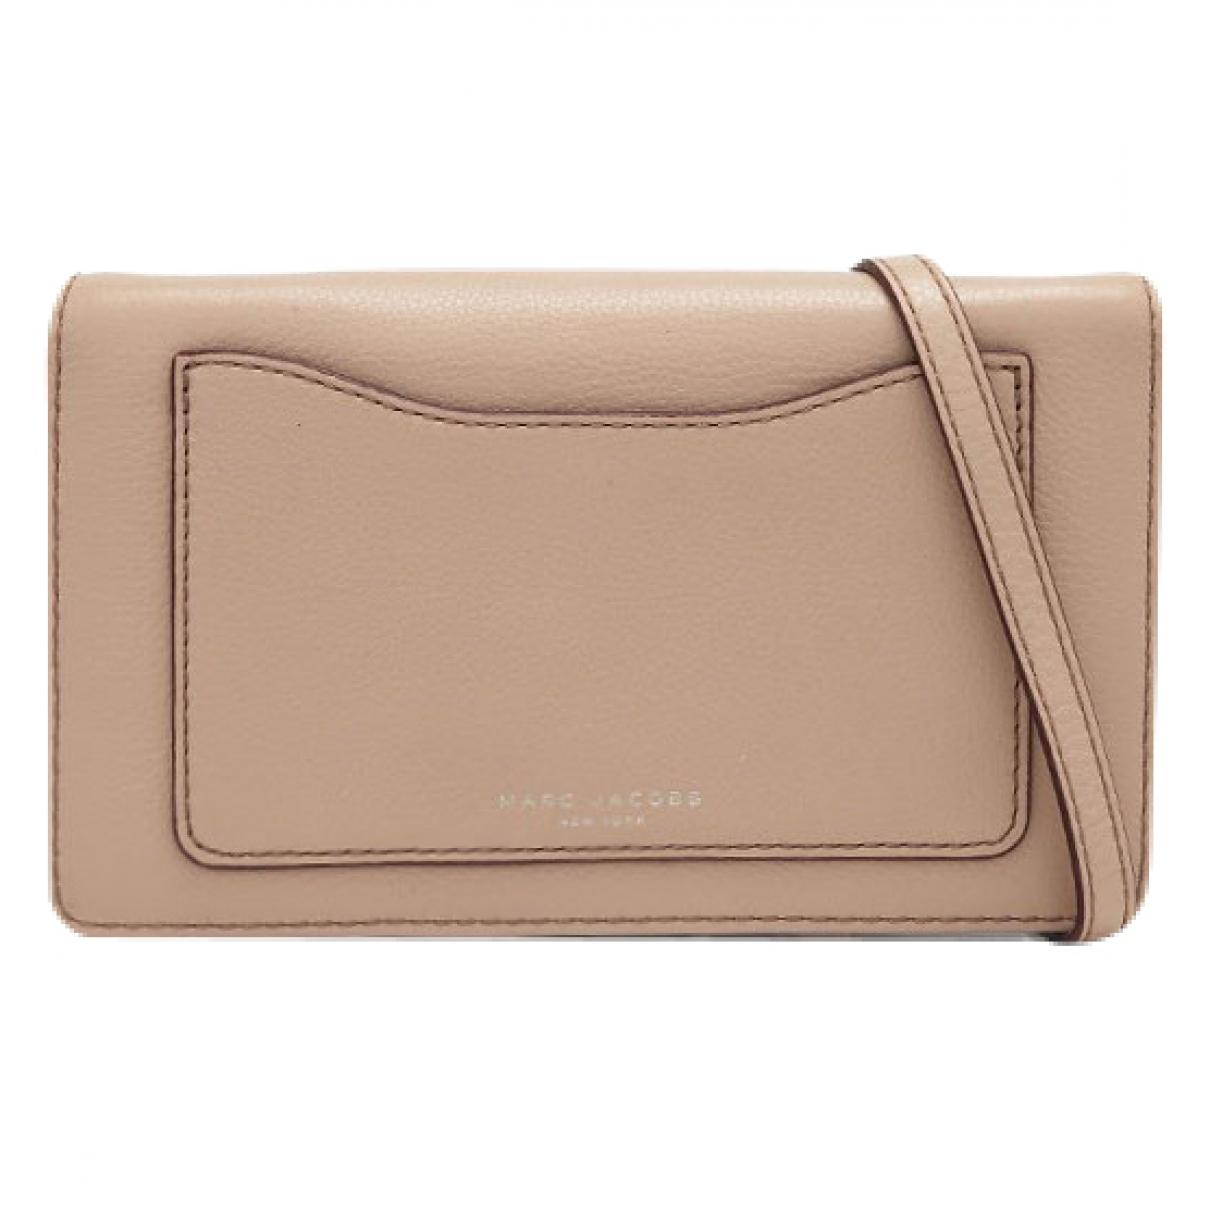 Marc Jacobs \N Beige Leather Clutch bag for Women \N